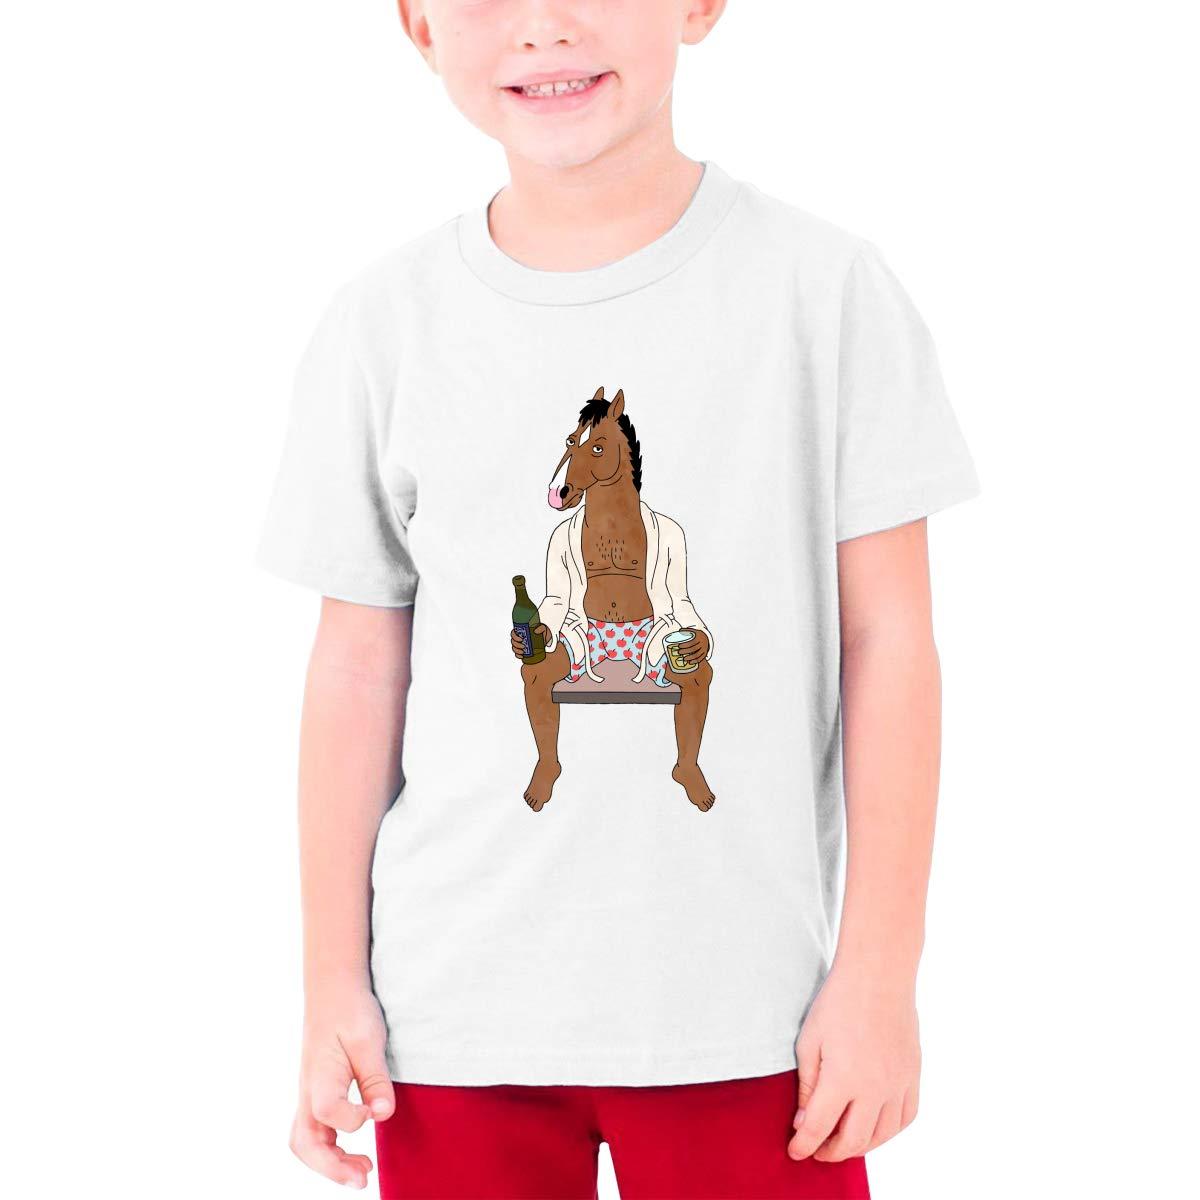 MasakoJMassie BojackHorseman Tee for Teenager Casual Cotton T Shirts Short Sleeve Boys Kids Girls